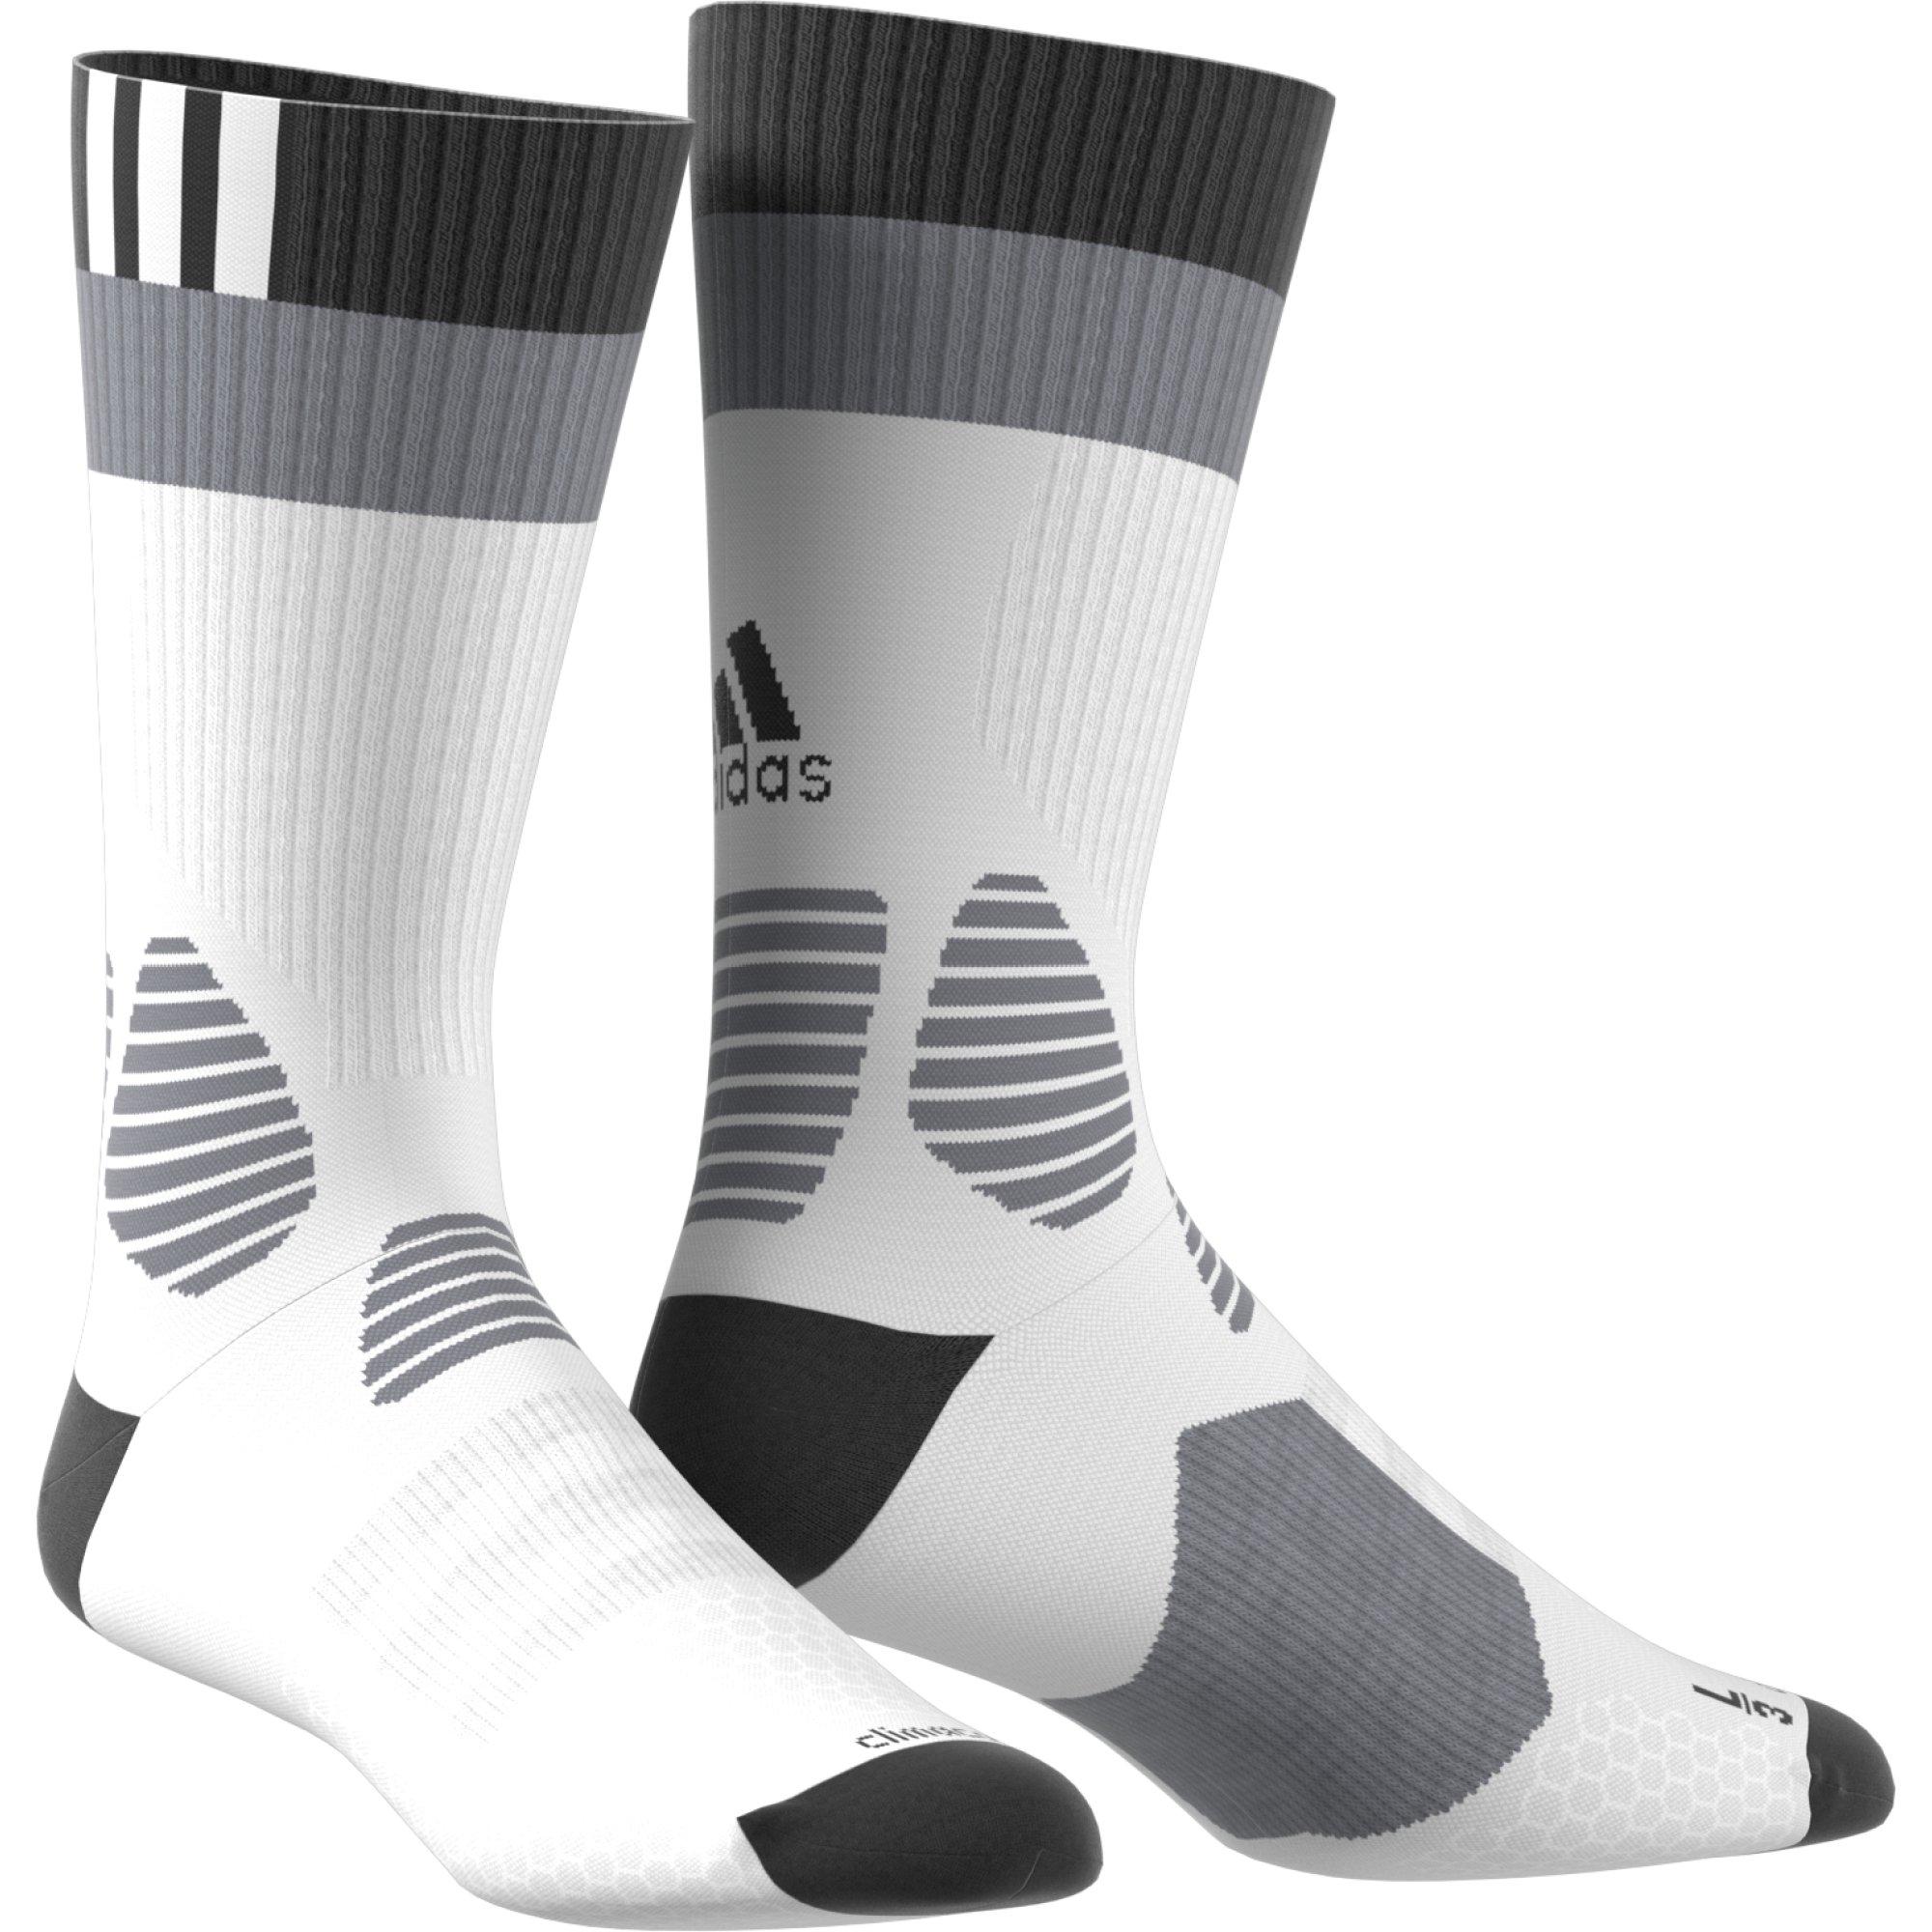 5422f8d4c adidas :: adidas Performance :: Akcesoria :: Getry i skarpetki ...